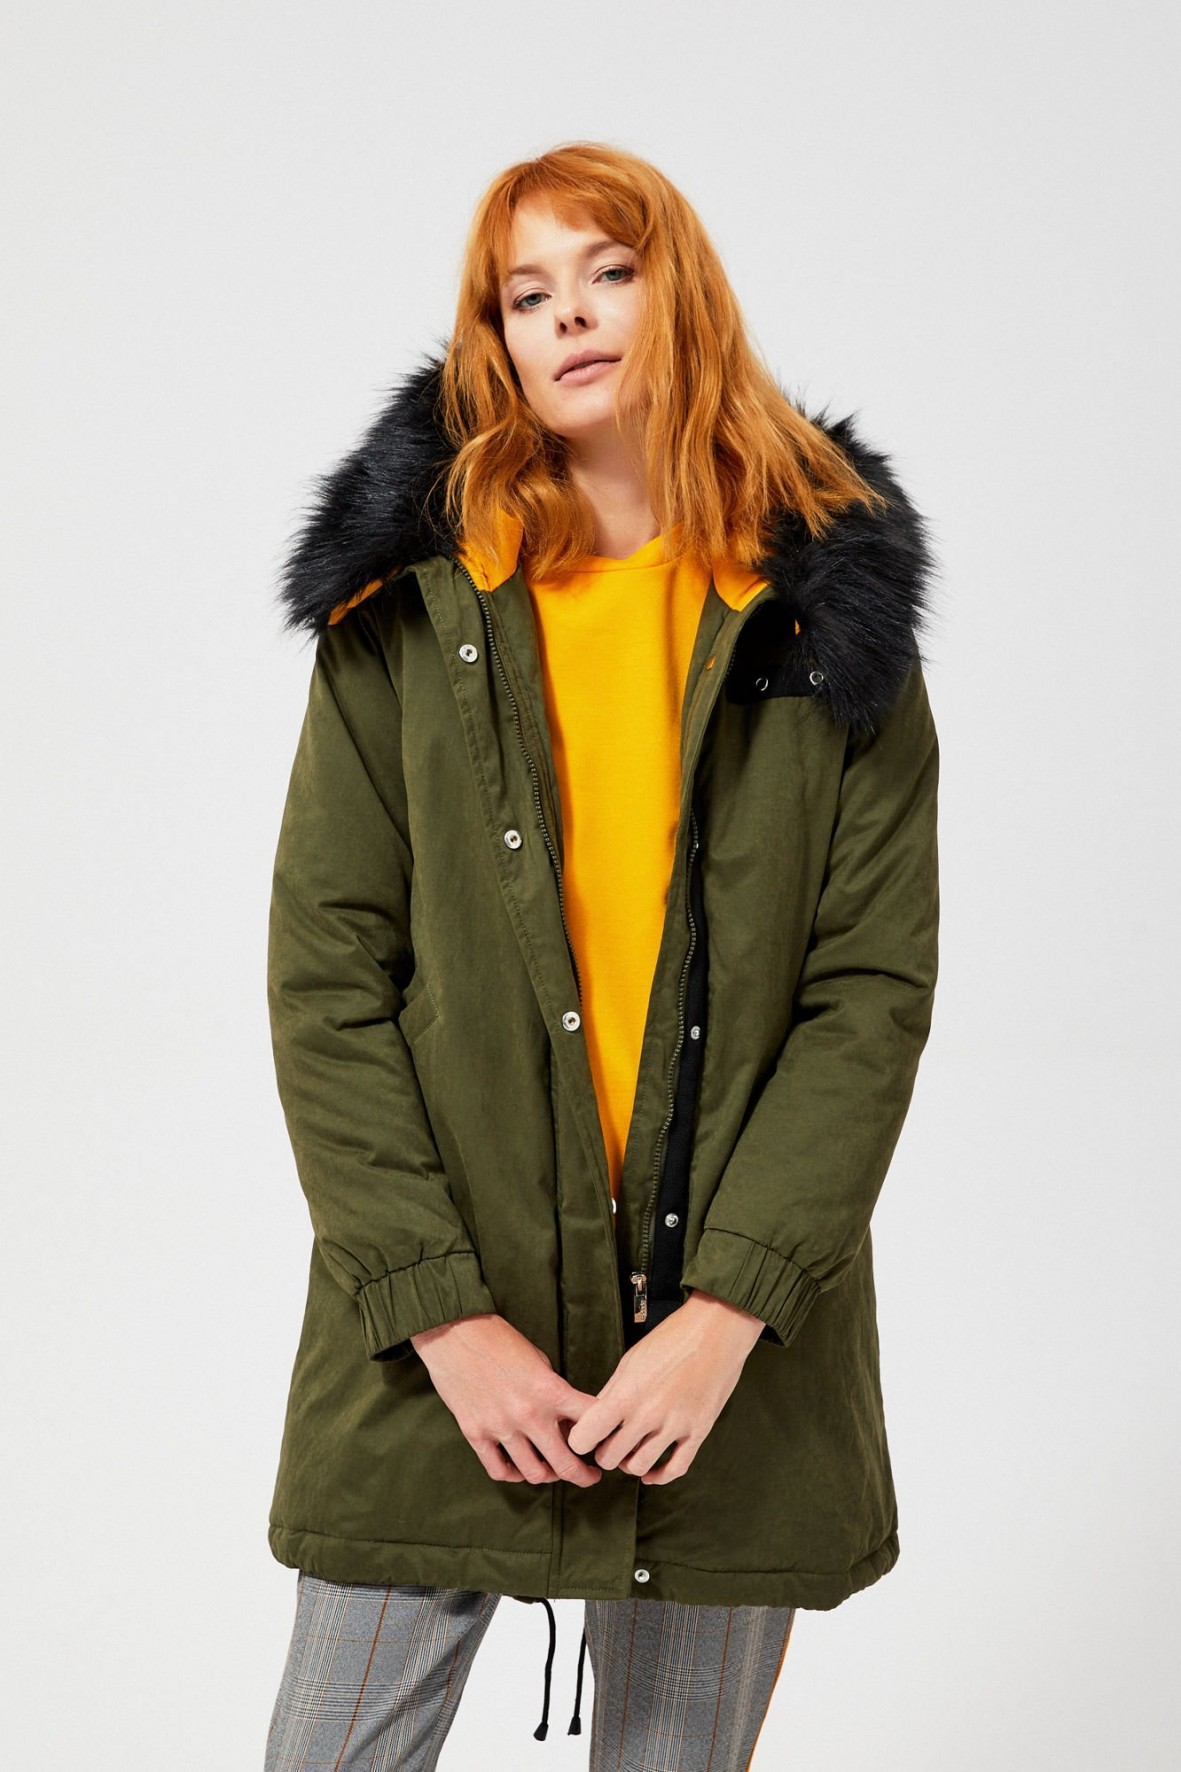 Zielona kurtka z kapturem